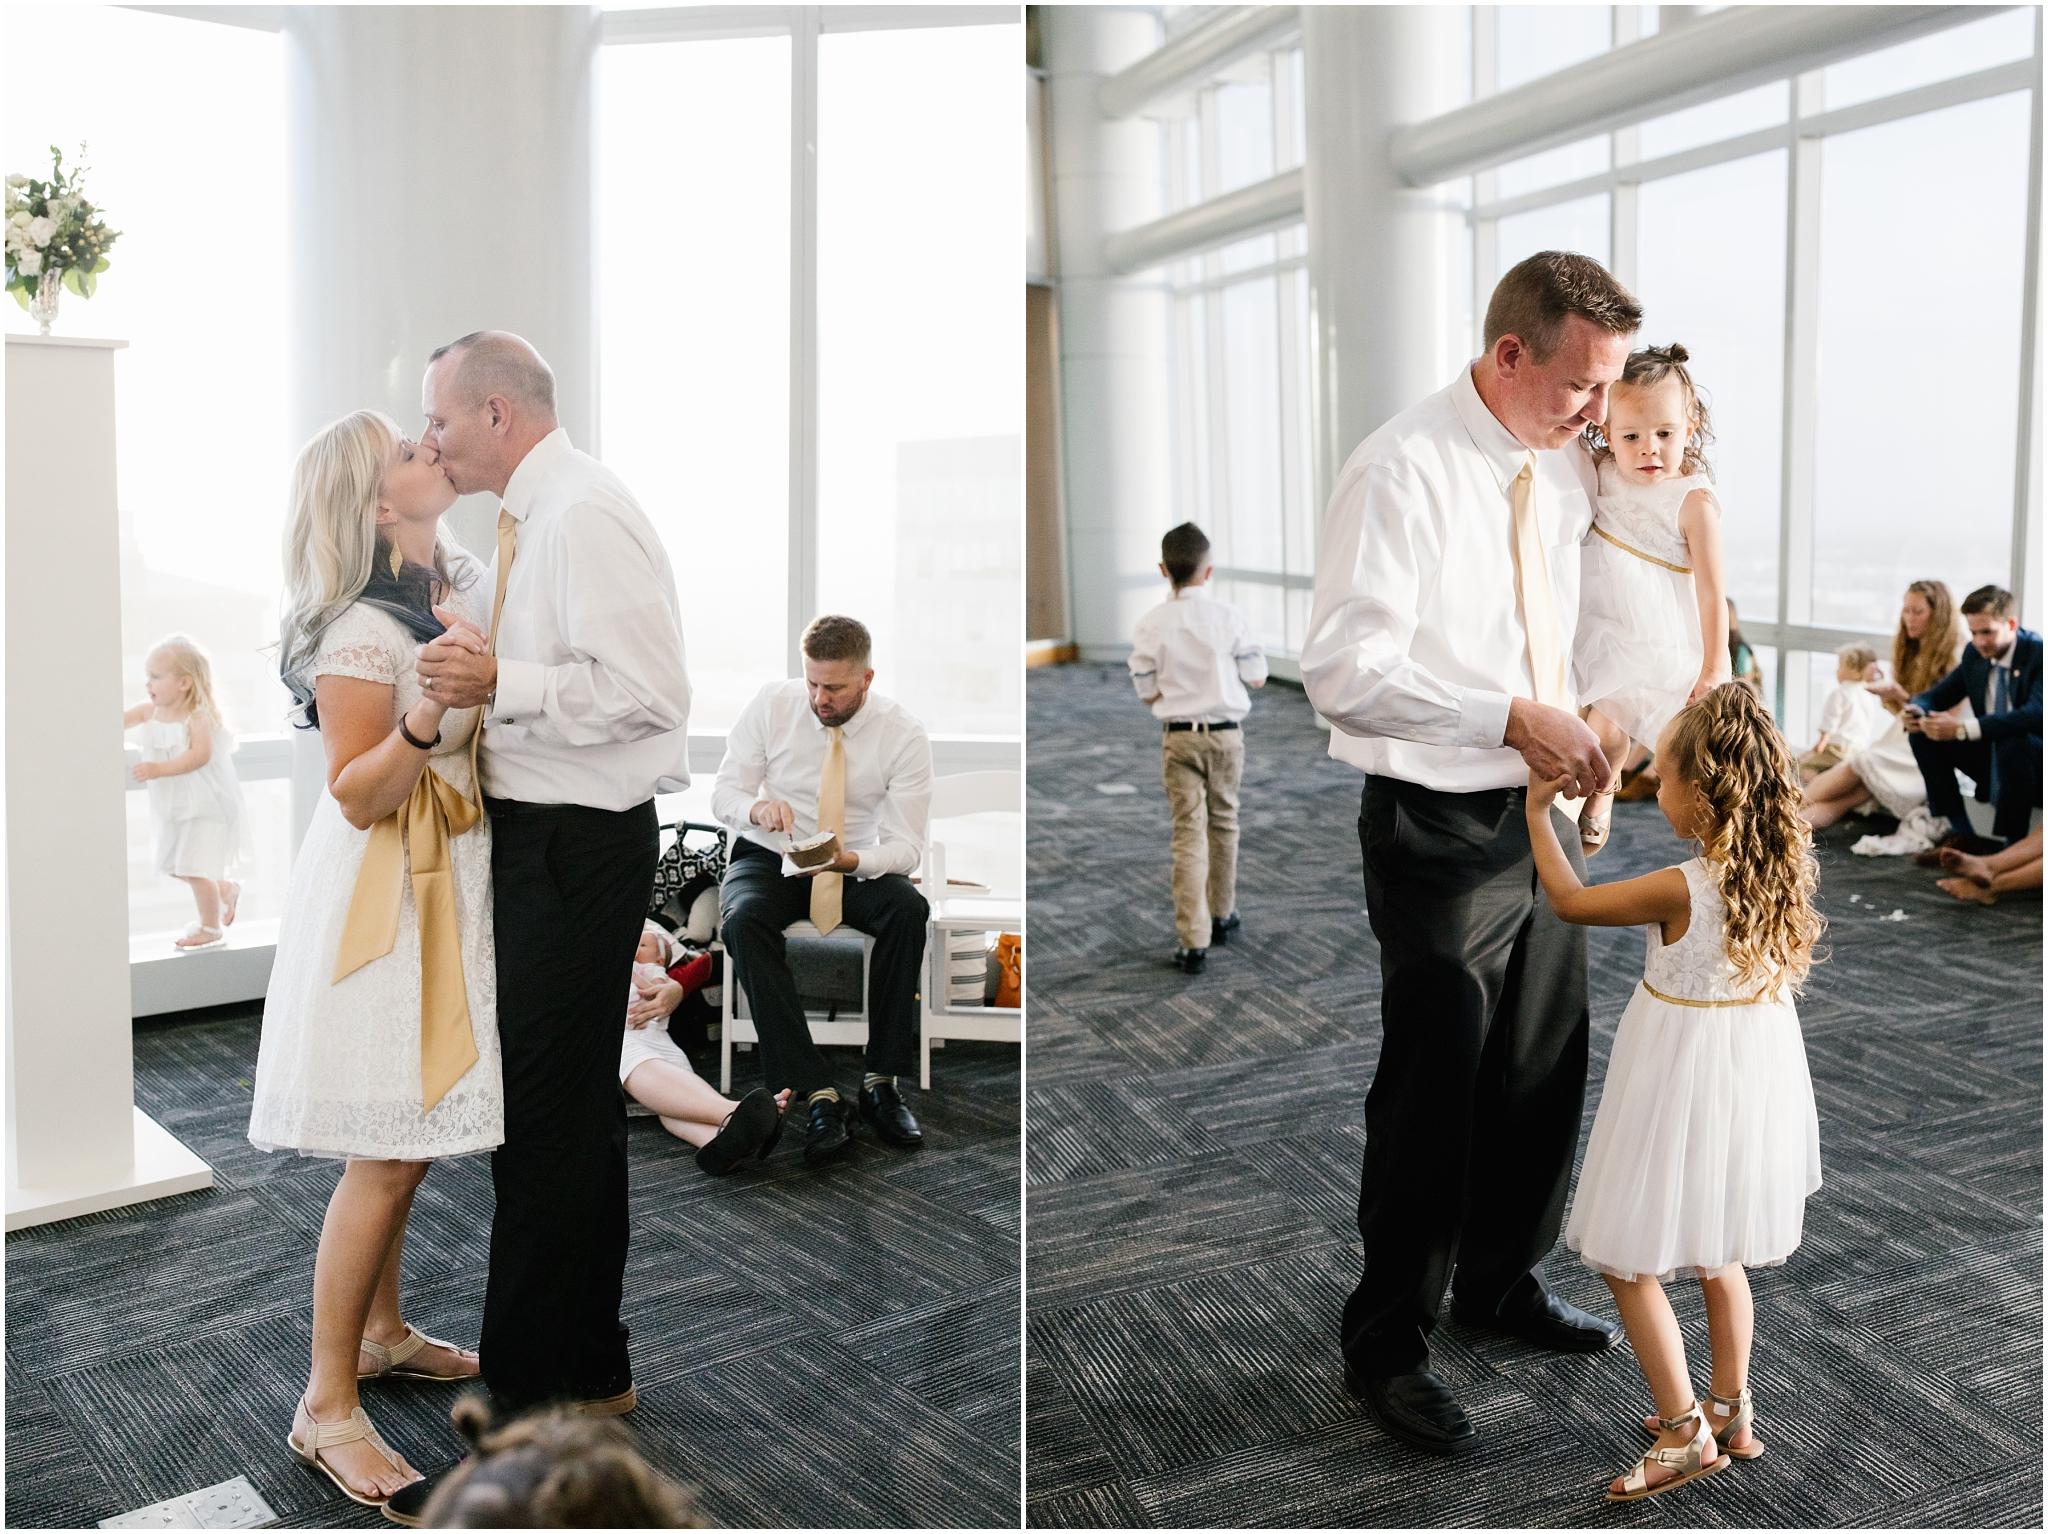 CherylandTyler-594_Lizzie-B-Imagery-Utah-Wedding-Photographer-Salt-Lake-City-Temple-Wells-Fargo-Building-Reception.jpg